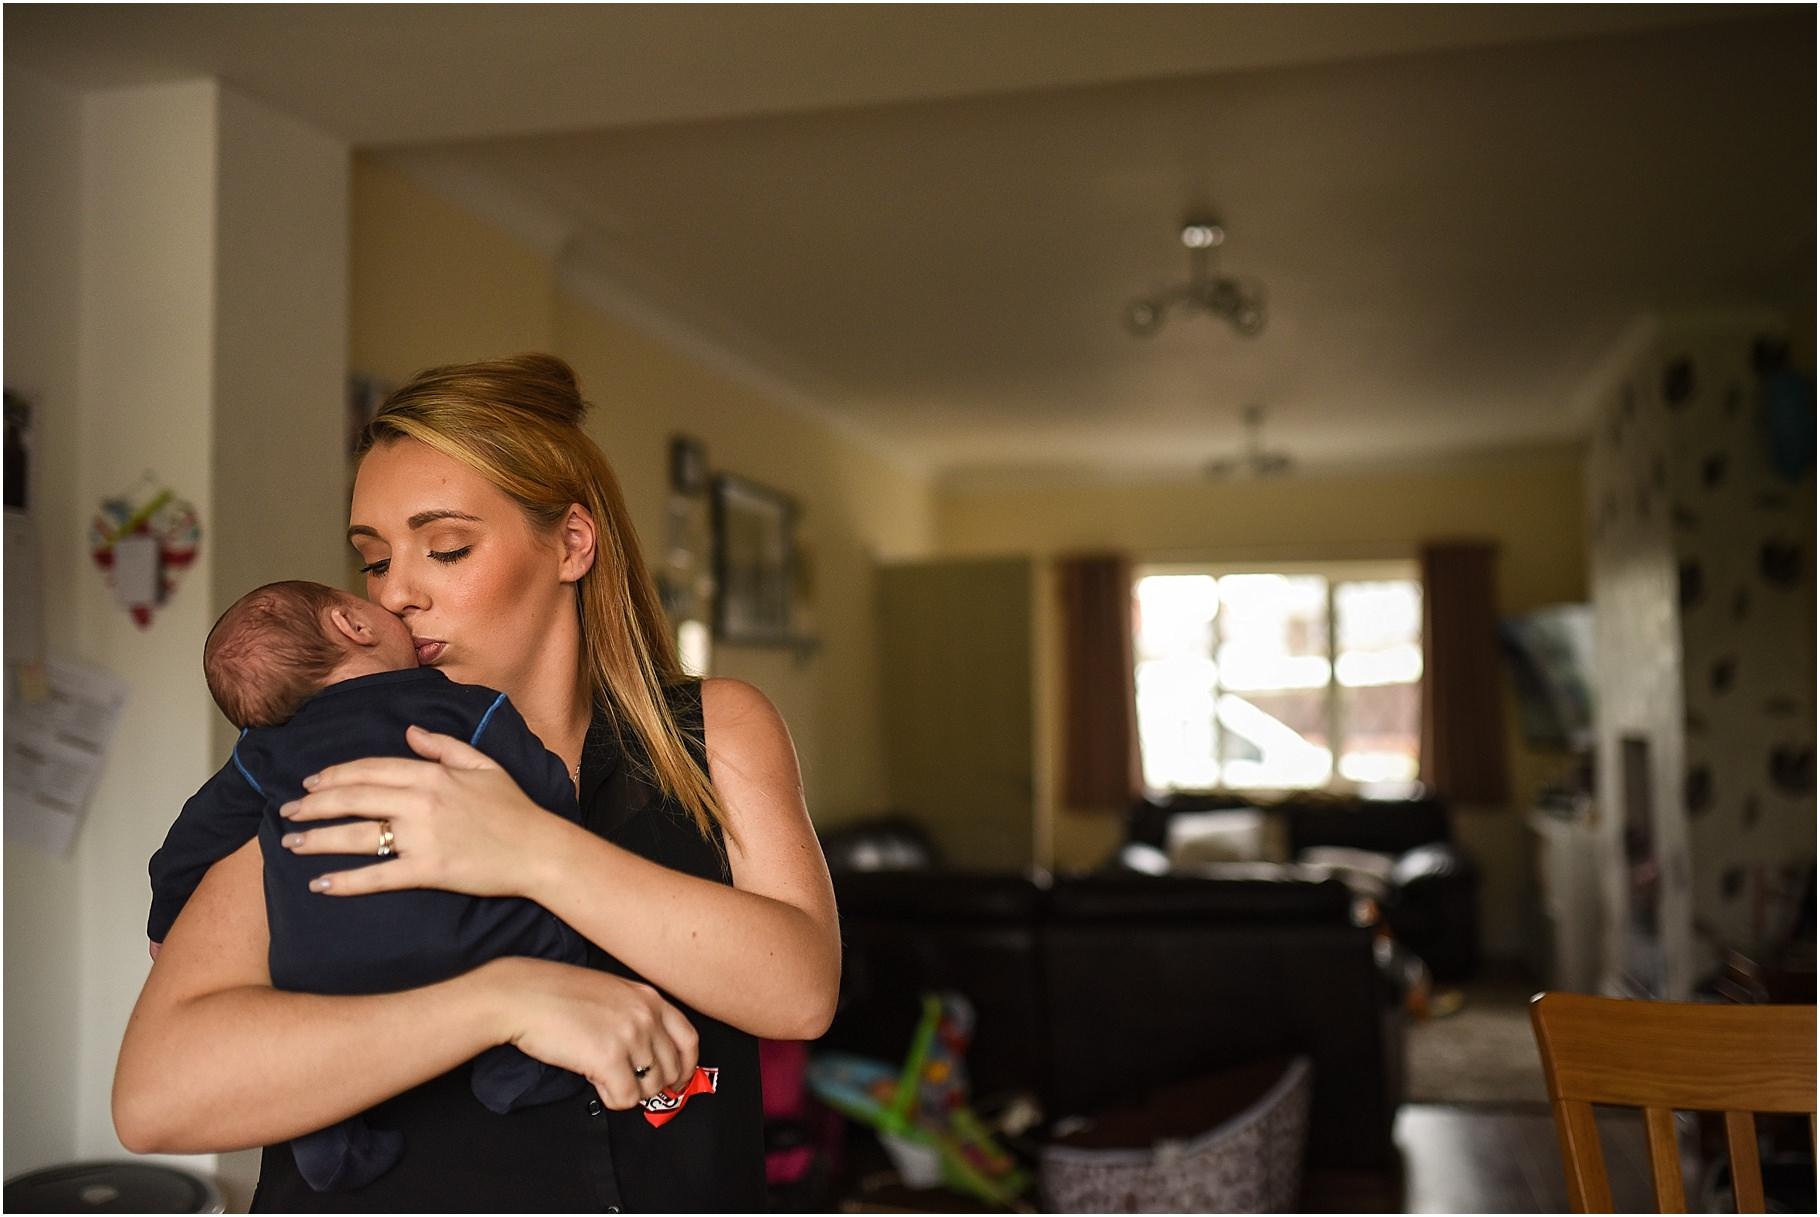 lancashire-family-portraits-documentary-newborn-36.jpg